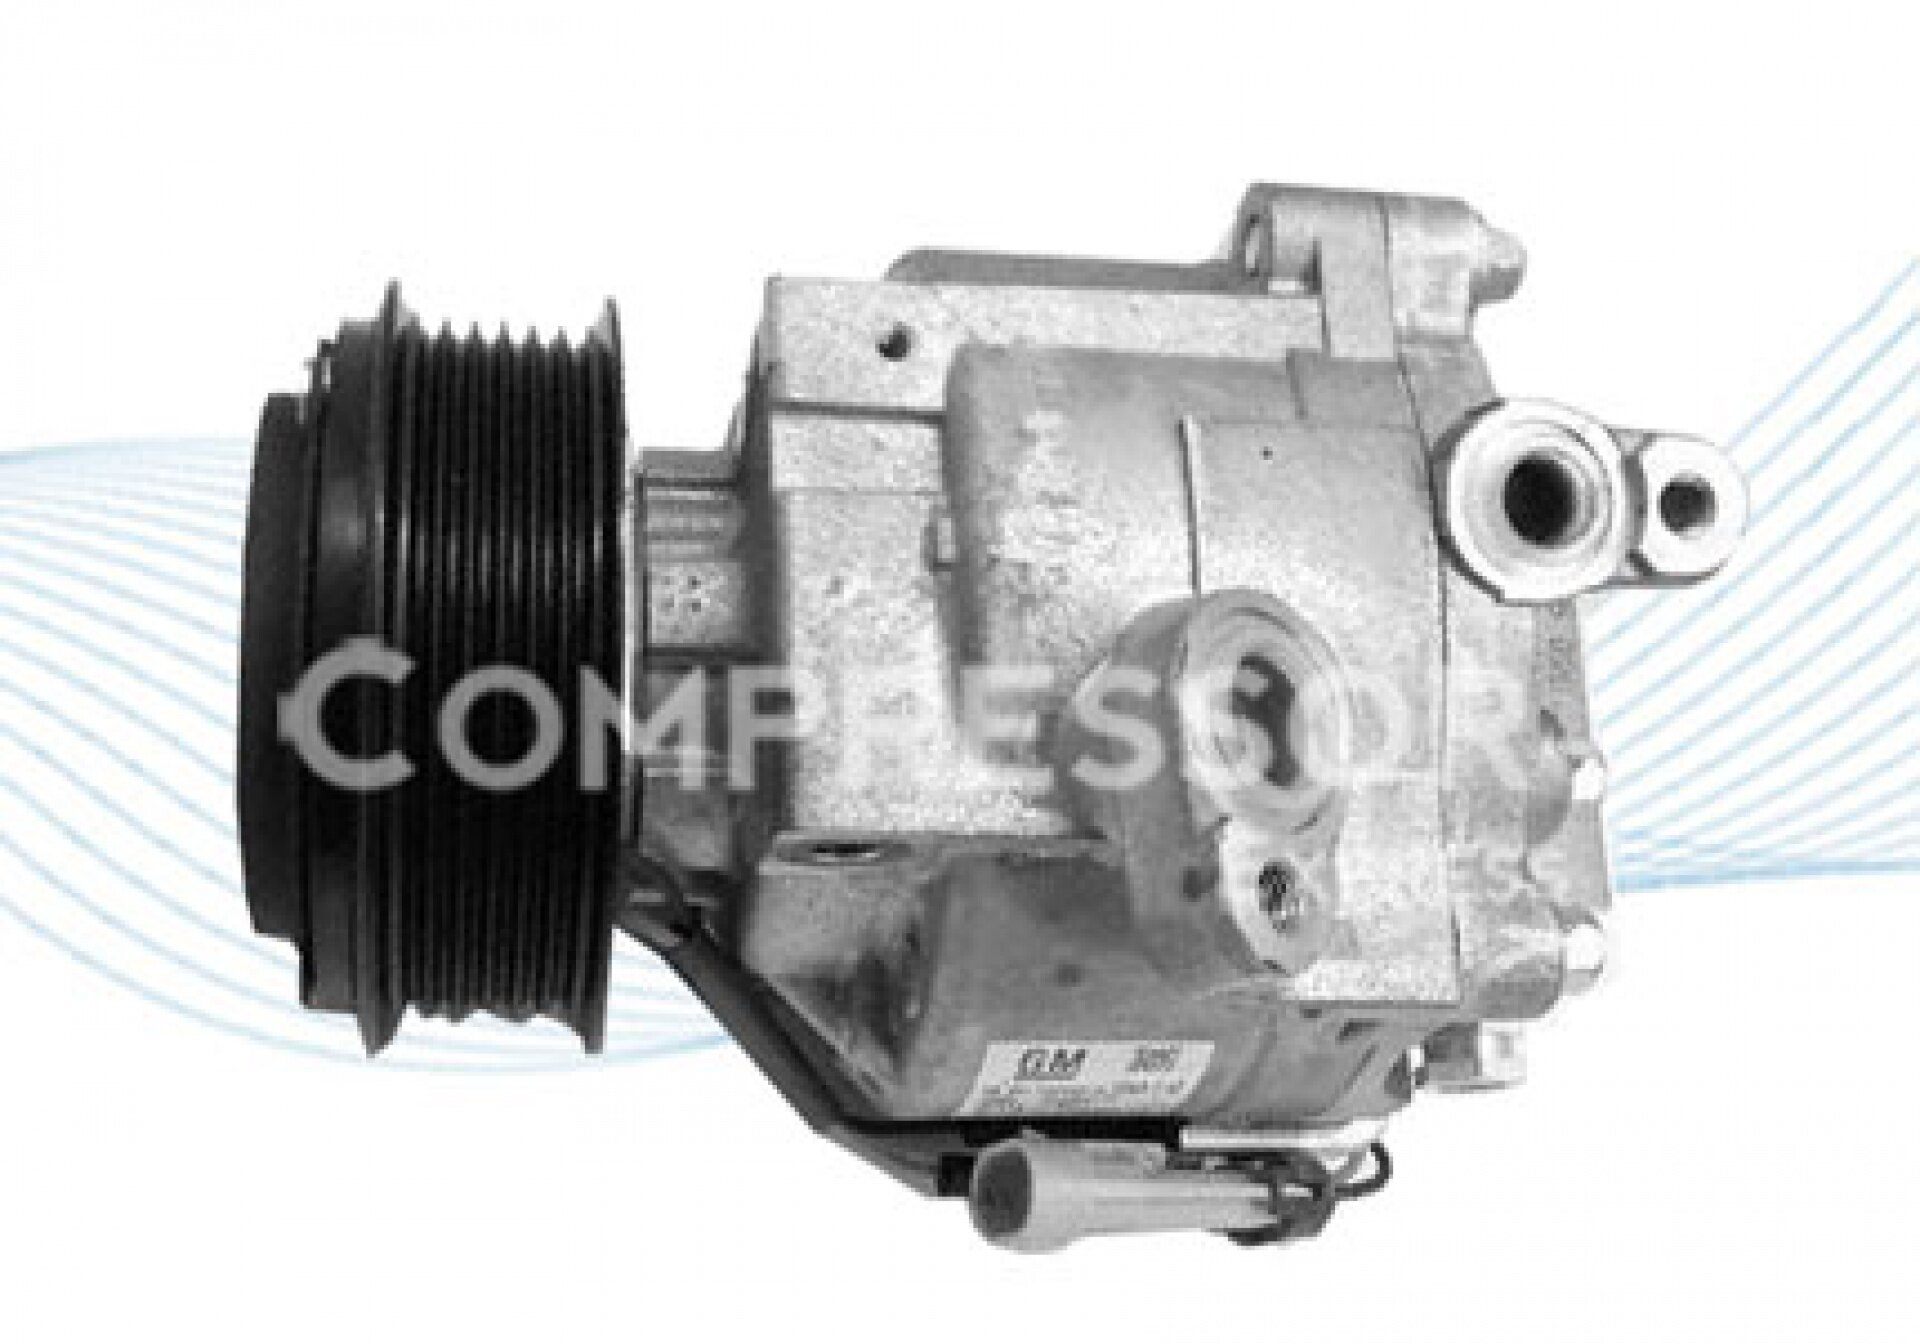 Chevrolet-Opel-11-QS90-PV6-REMAN